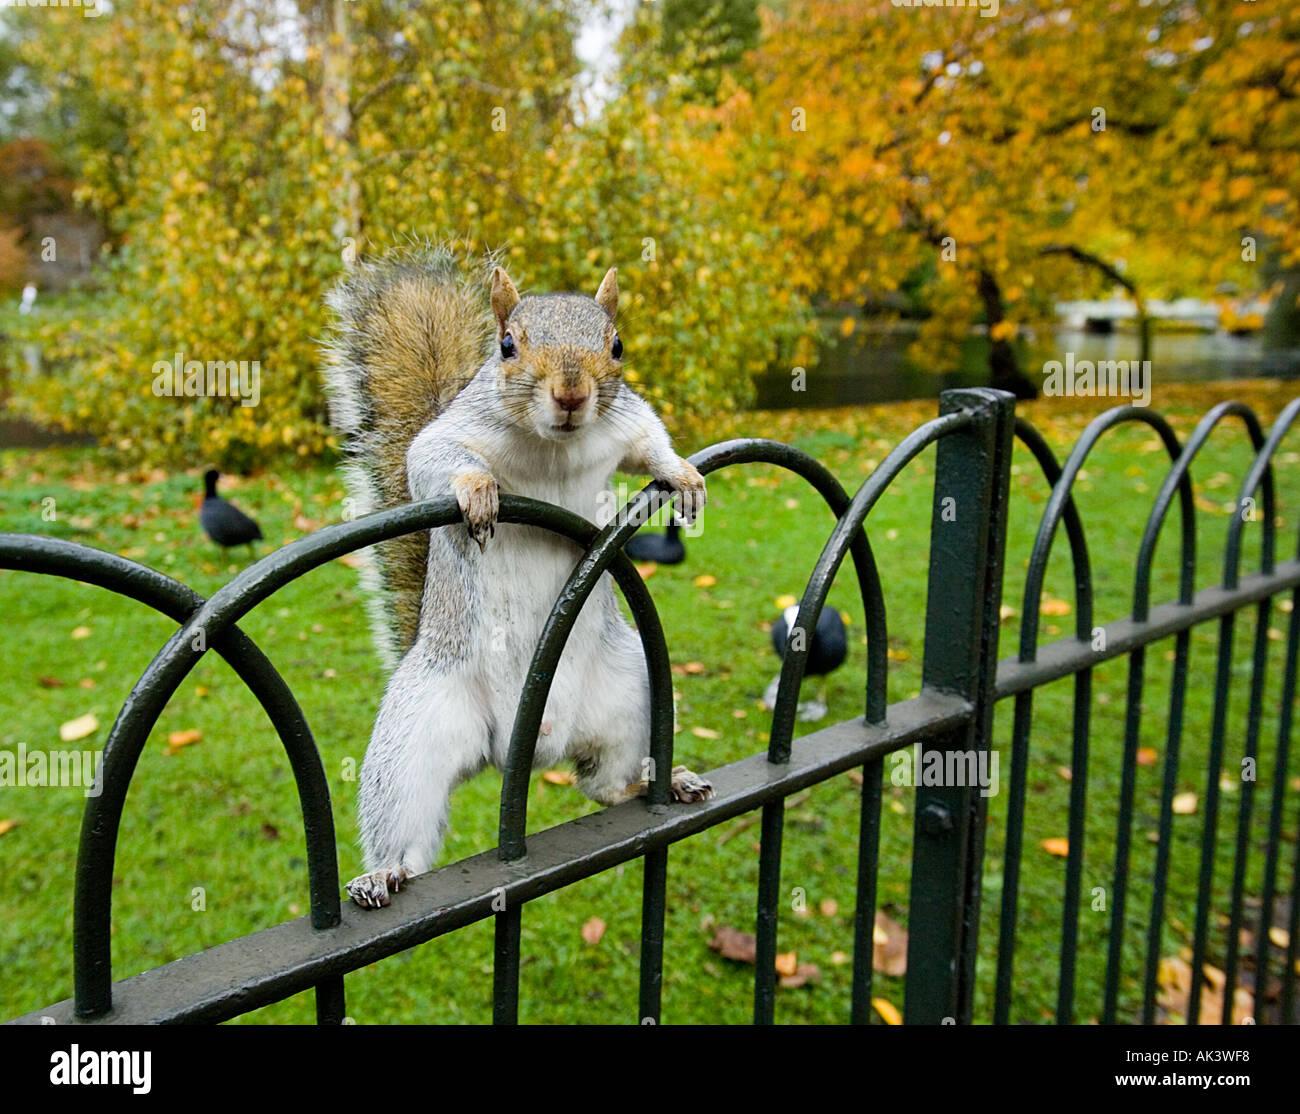 Ardilla gris en St James Park, Londres, Gran Bretaña. Imagen De Stock